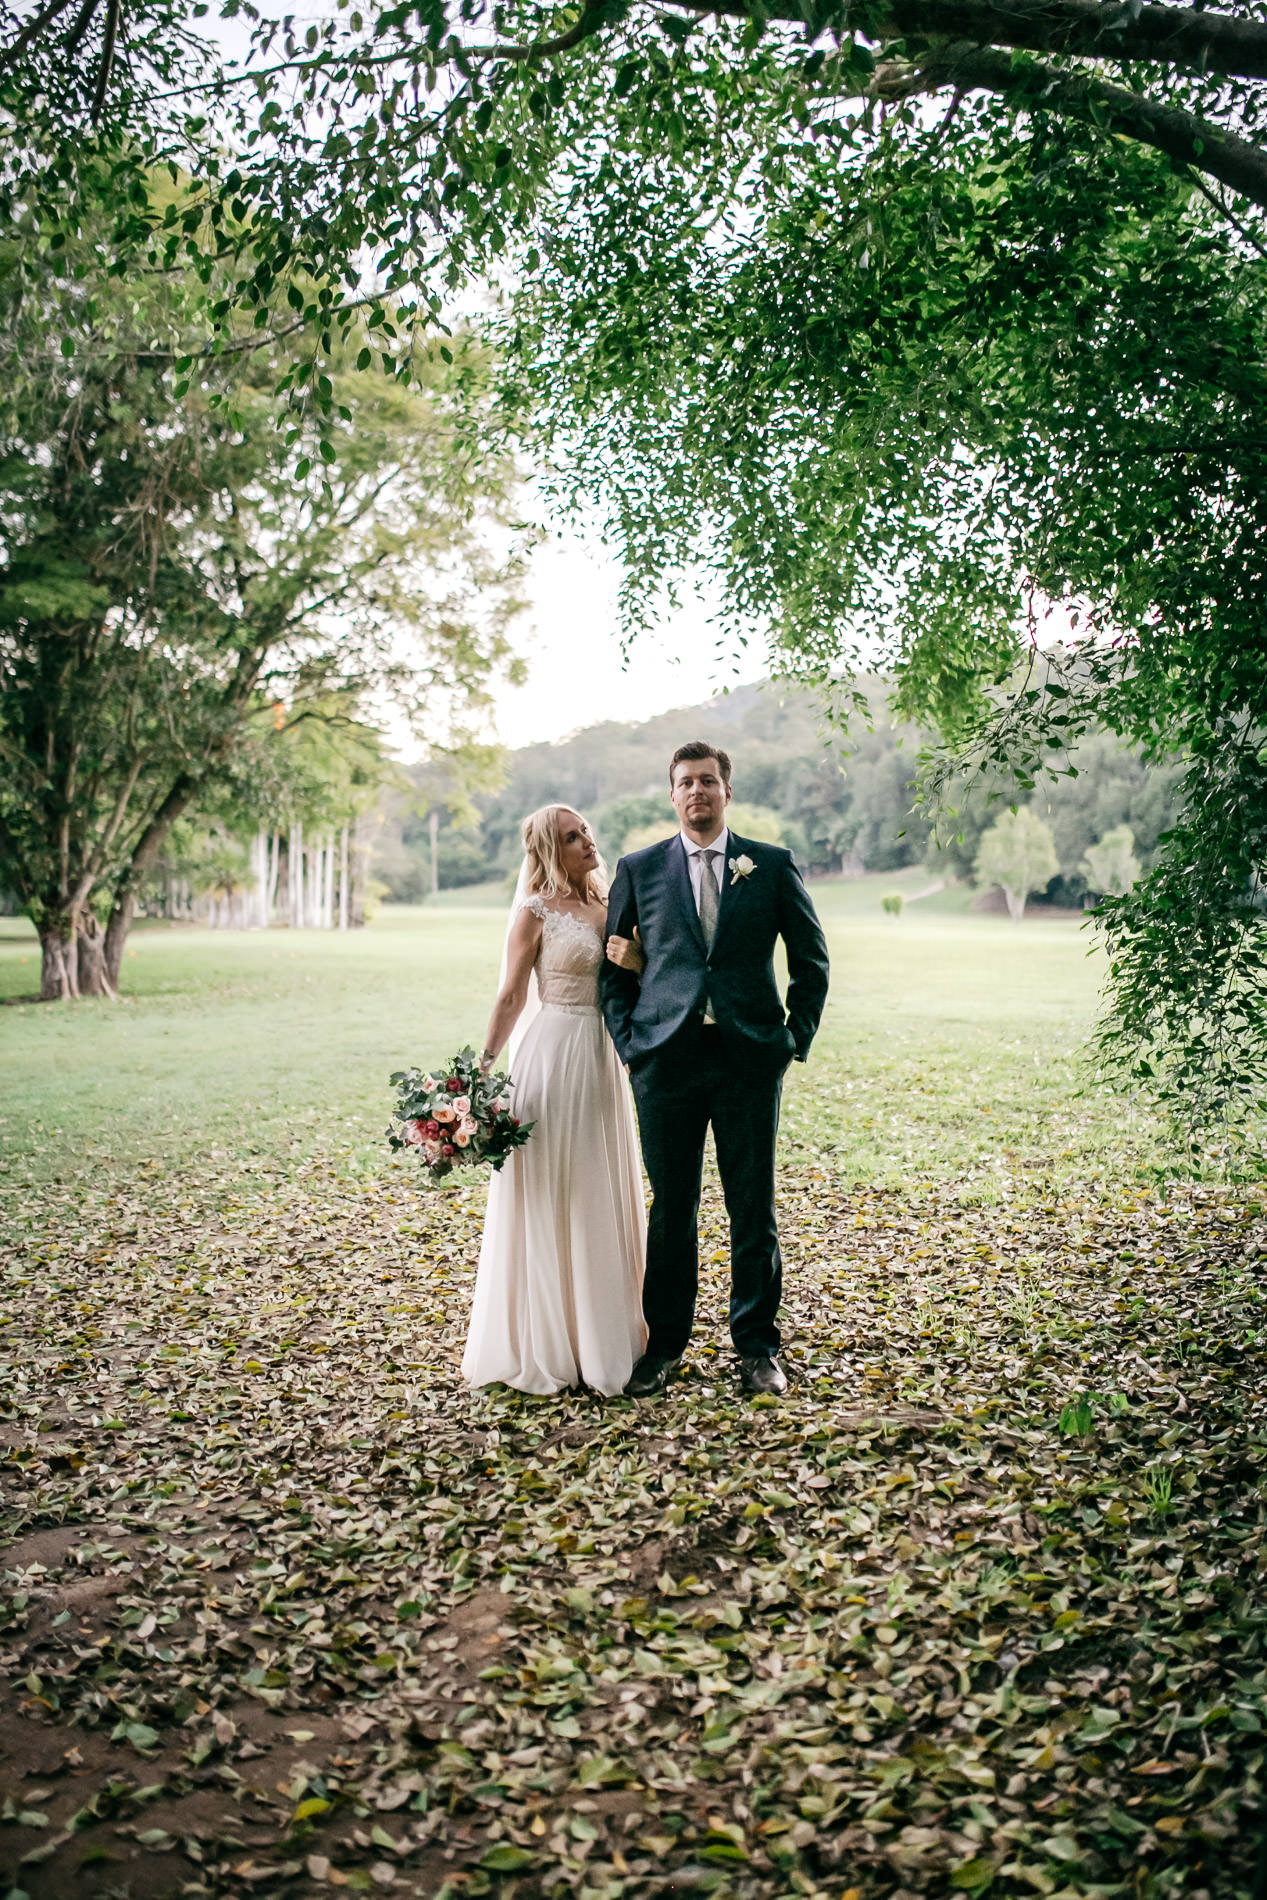 True North Photography_Boomerang Farm_Stacey and Isaac_Gold Coast Wedding_Barm Wedding_Hinterland Wedding-174.jpg